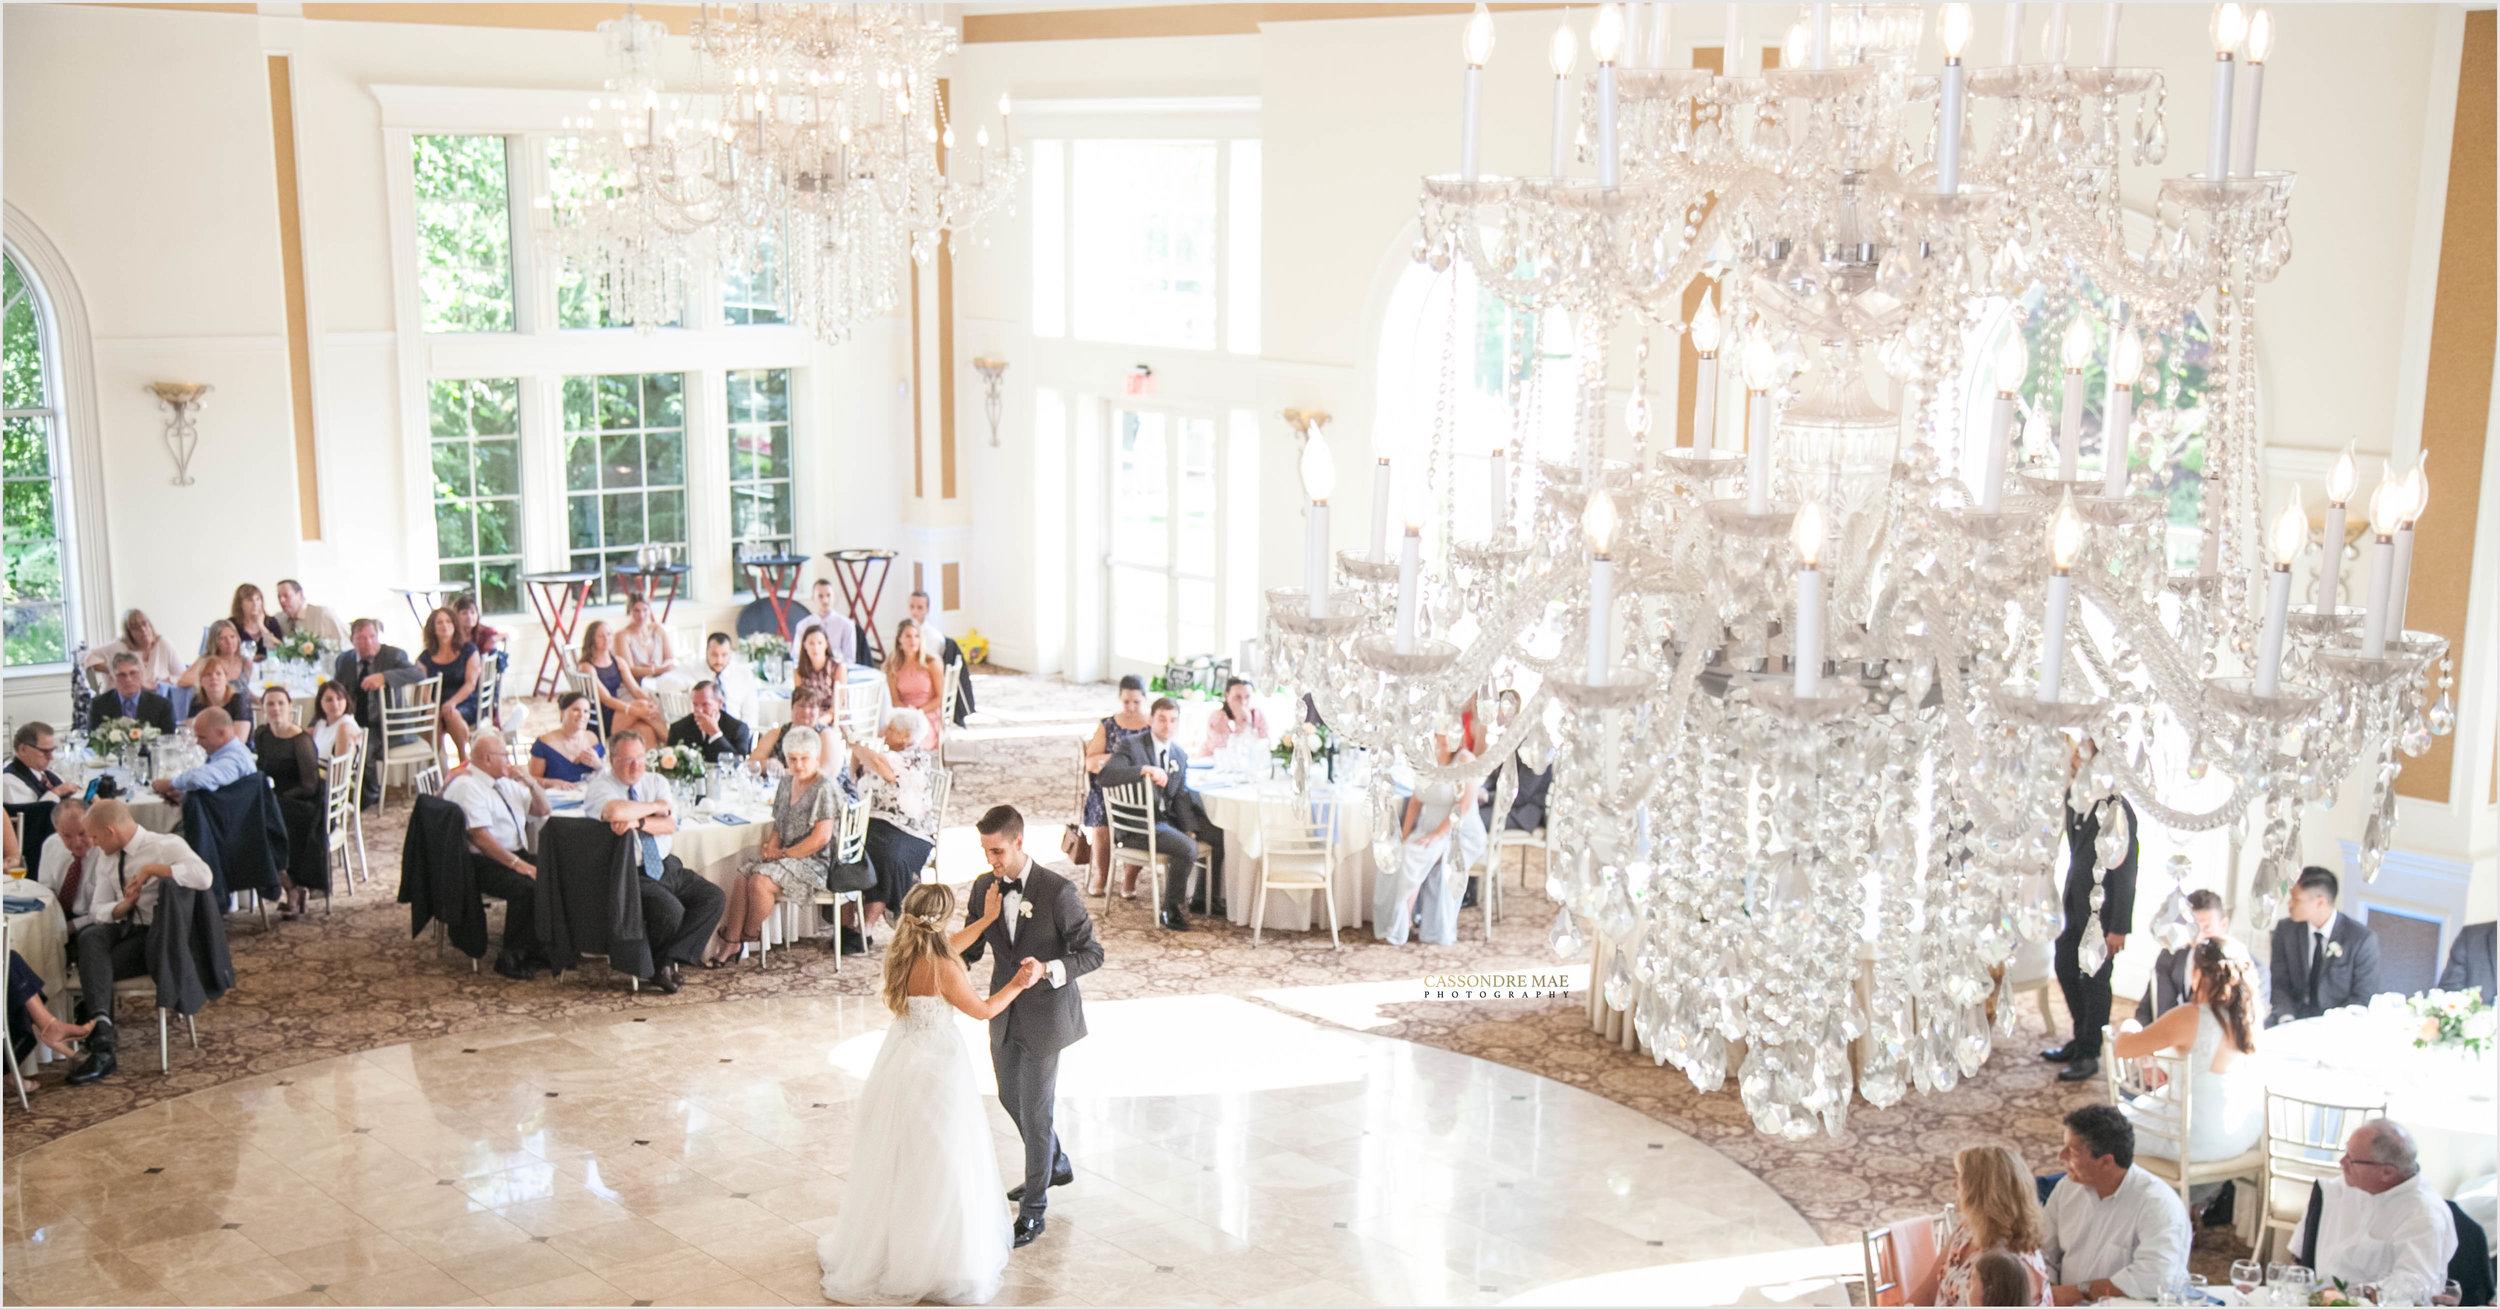 Cassondre Mae Photography Hudson Valley NY Wedding Photographer -31.jpg